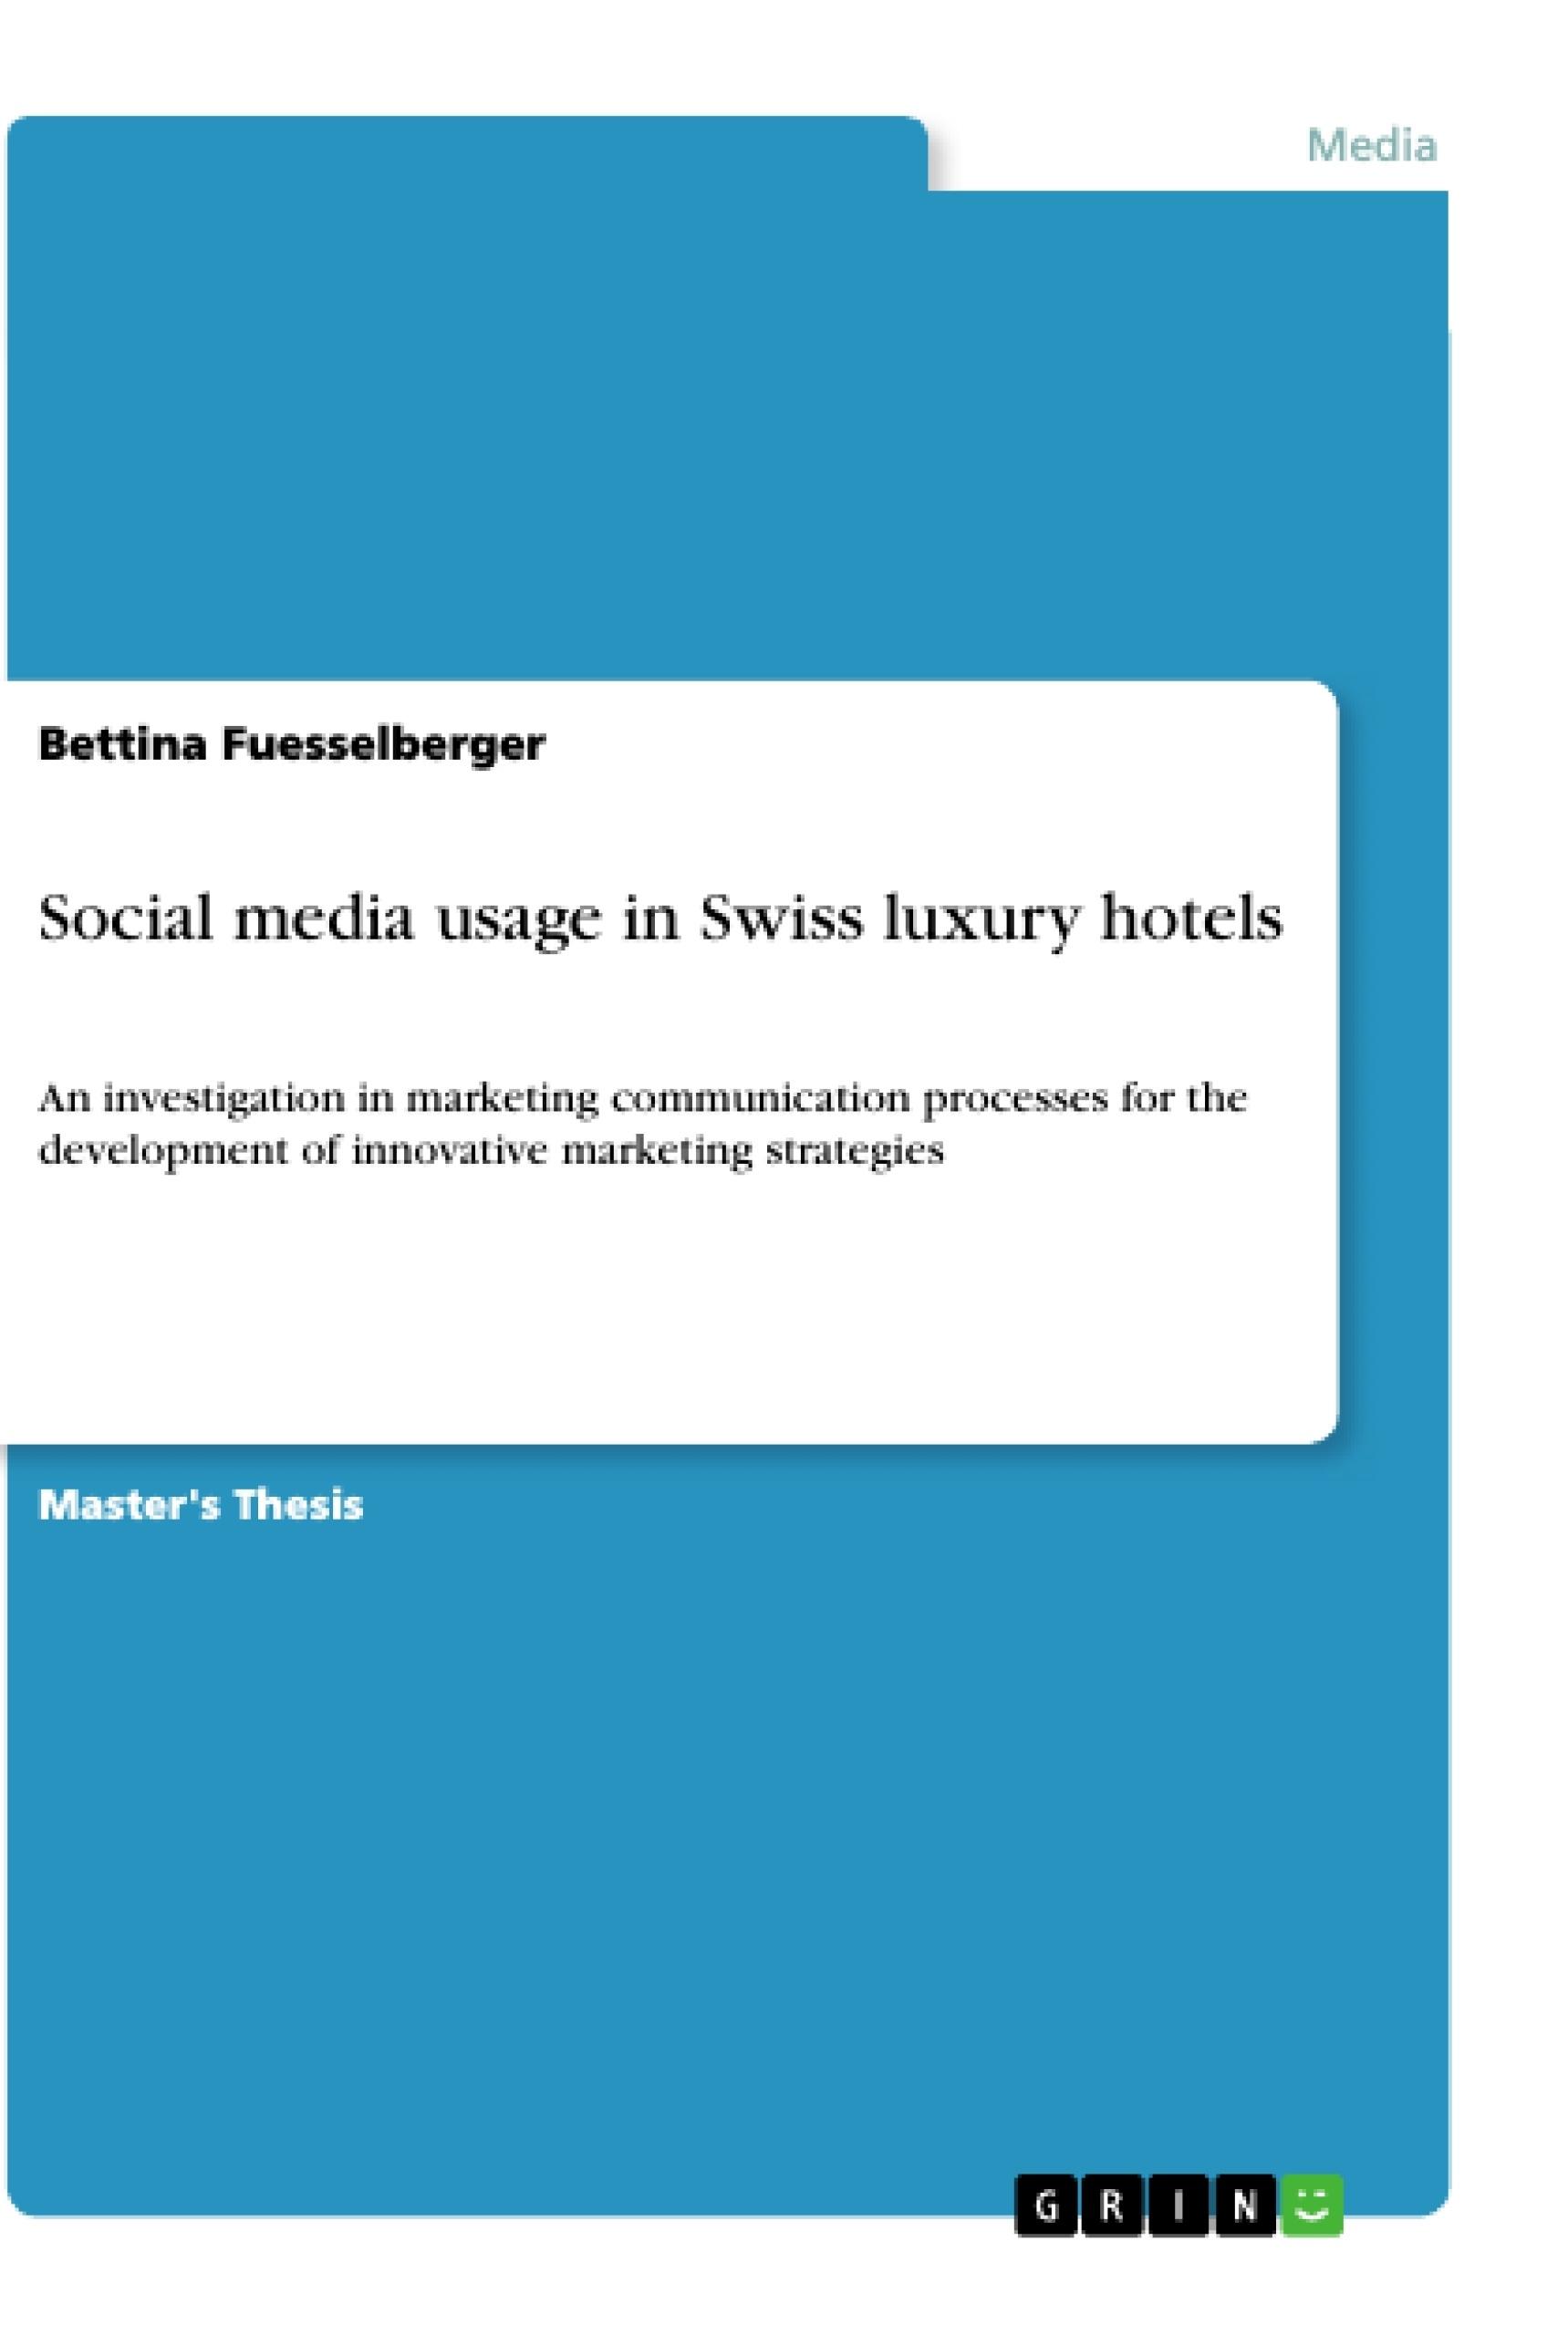 Title: Social media usage in Swiss luxury hotels